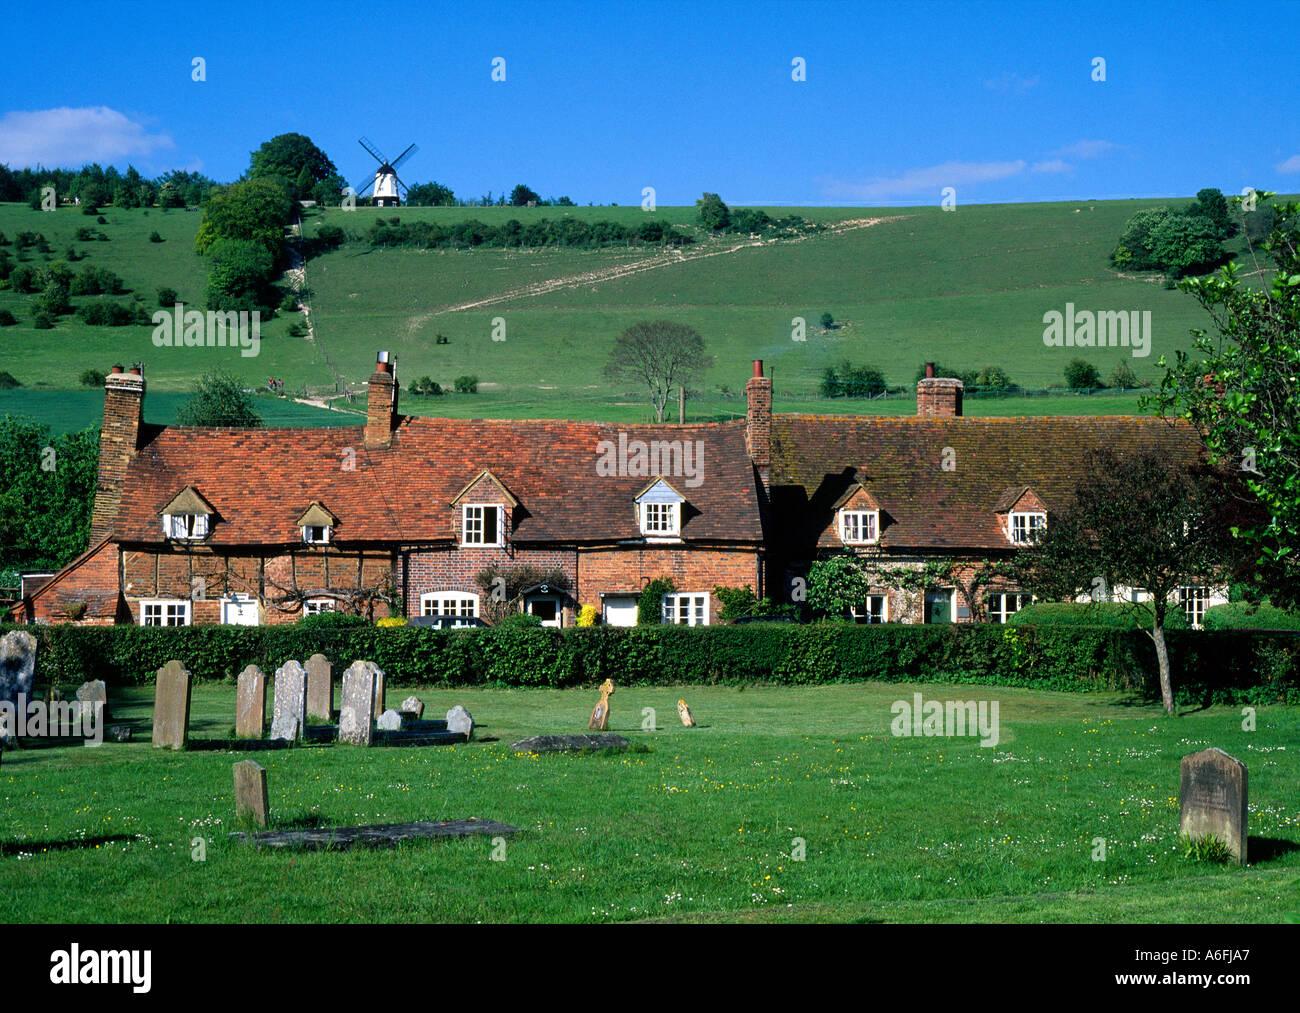 Turville Buckinghamshire England UK English village brick semi timbered cottages windmill travel tourism Chilterns rural charm - Stock Image